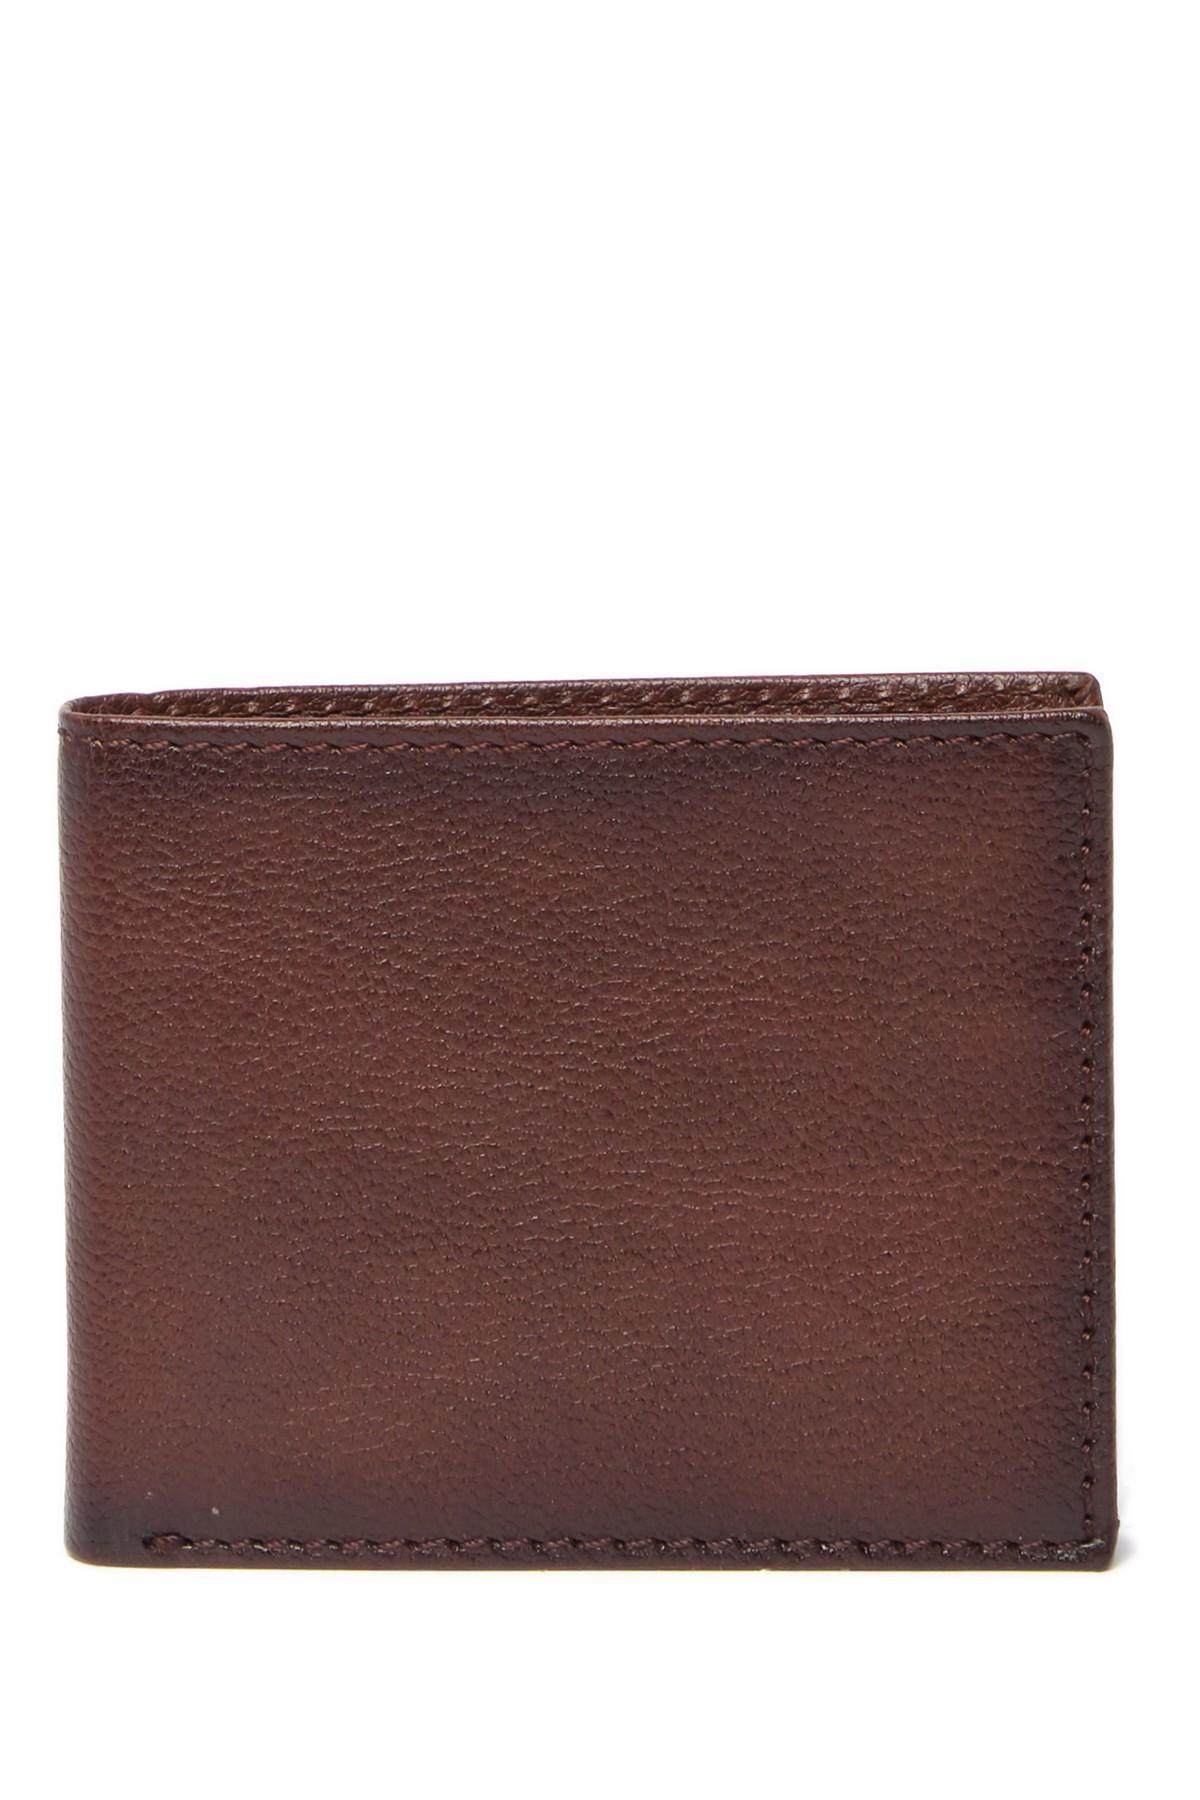 b505493da Lyst - Boconi Stills Leather Billfold Wallet in Brown for Men